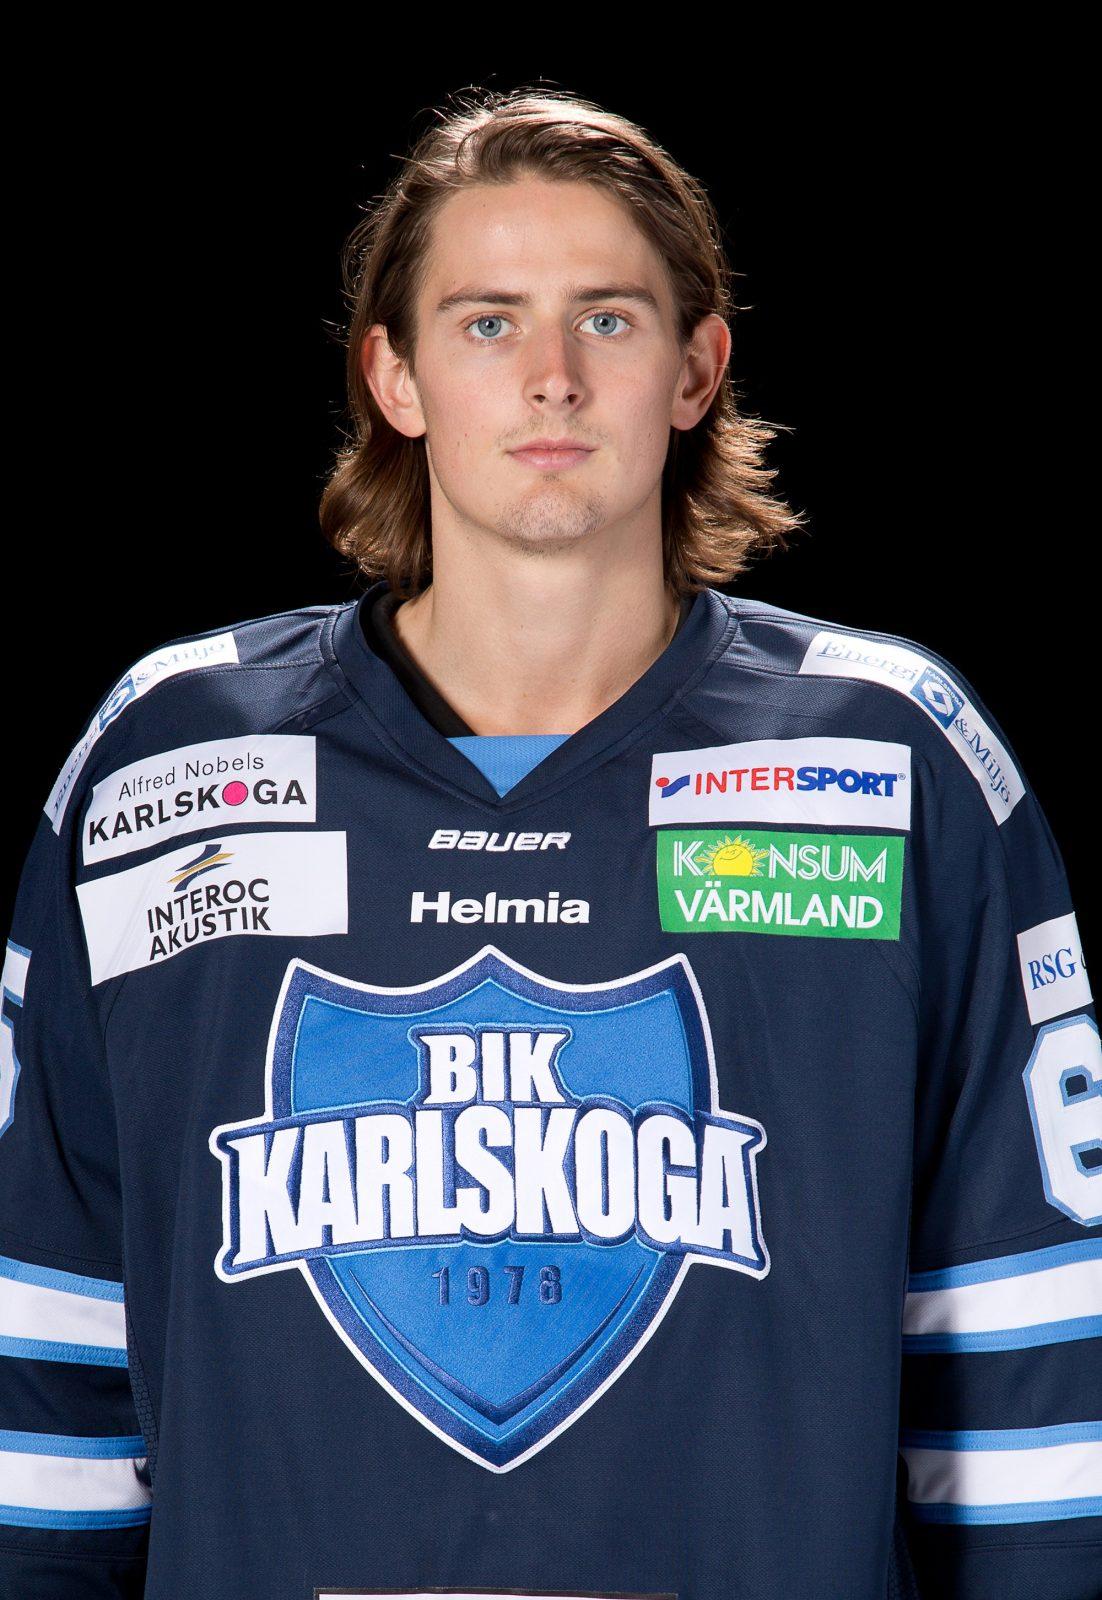 Karlskoga lånar ut till division 1-klubben